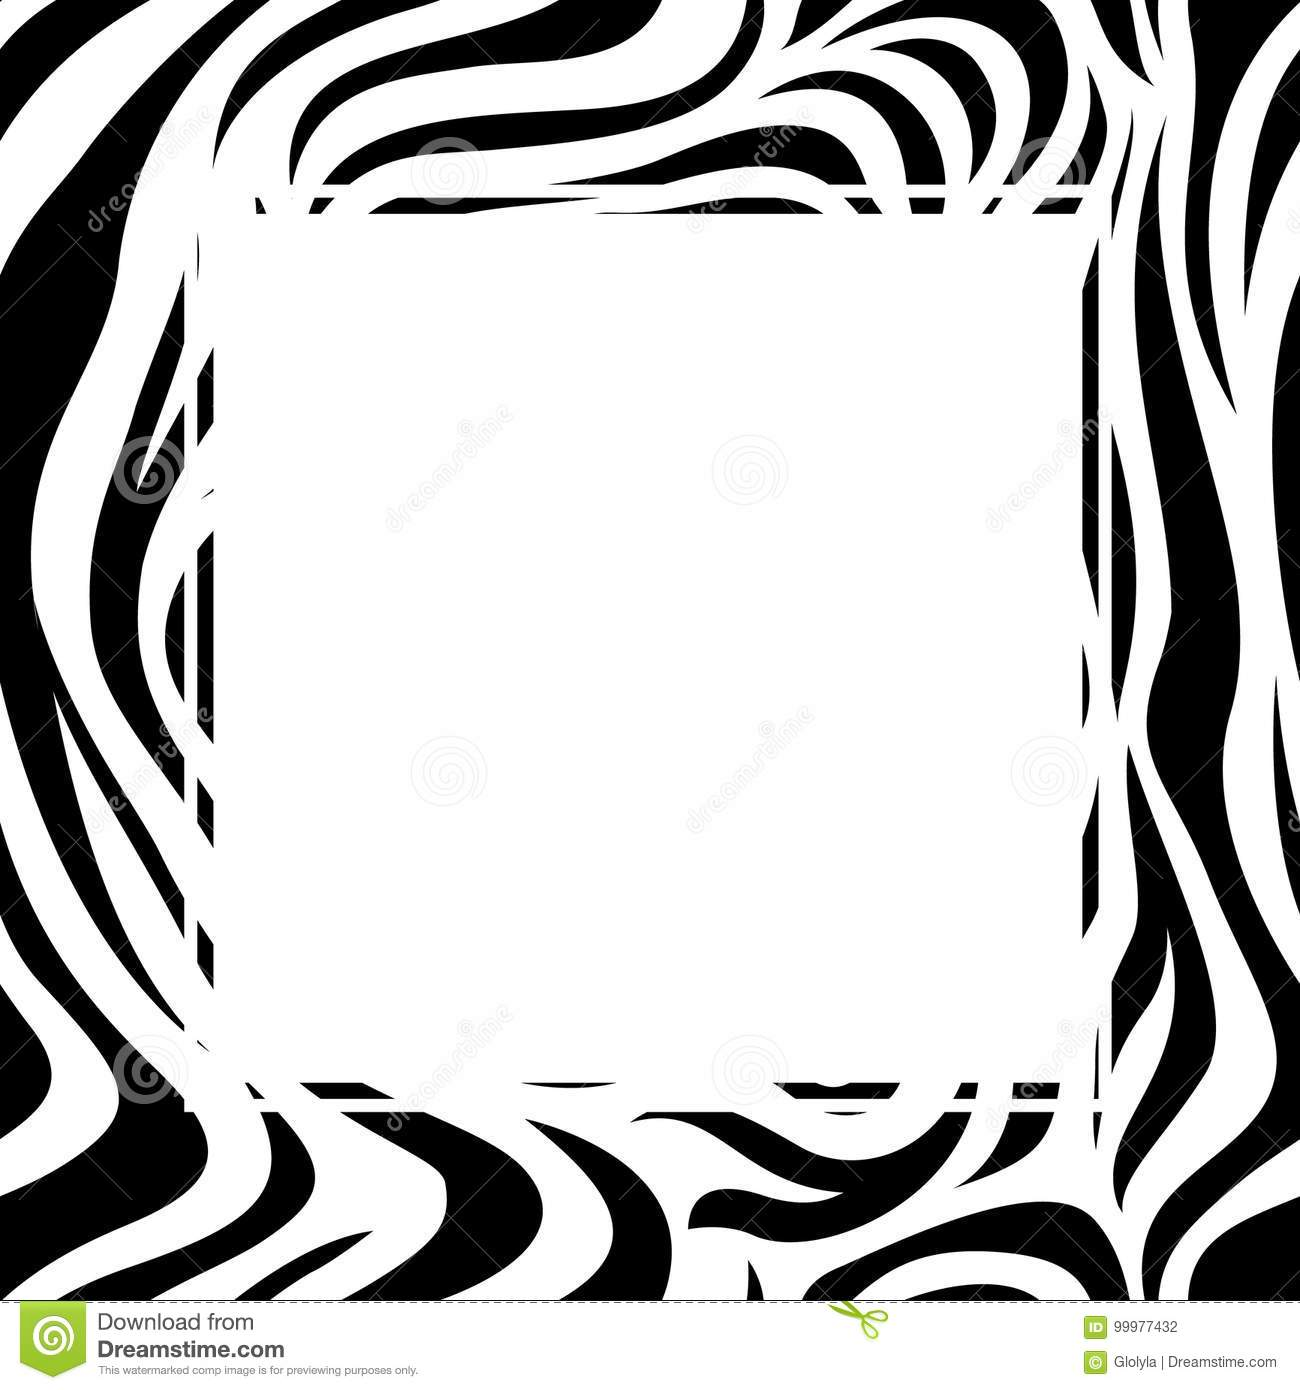 Zebra Print Border Design. Animal Skin Texture. Stock Vector.